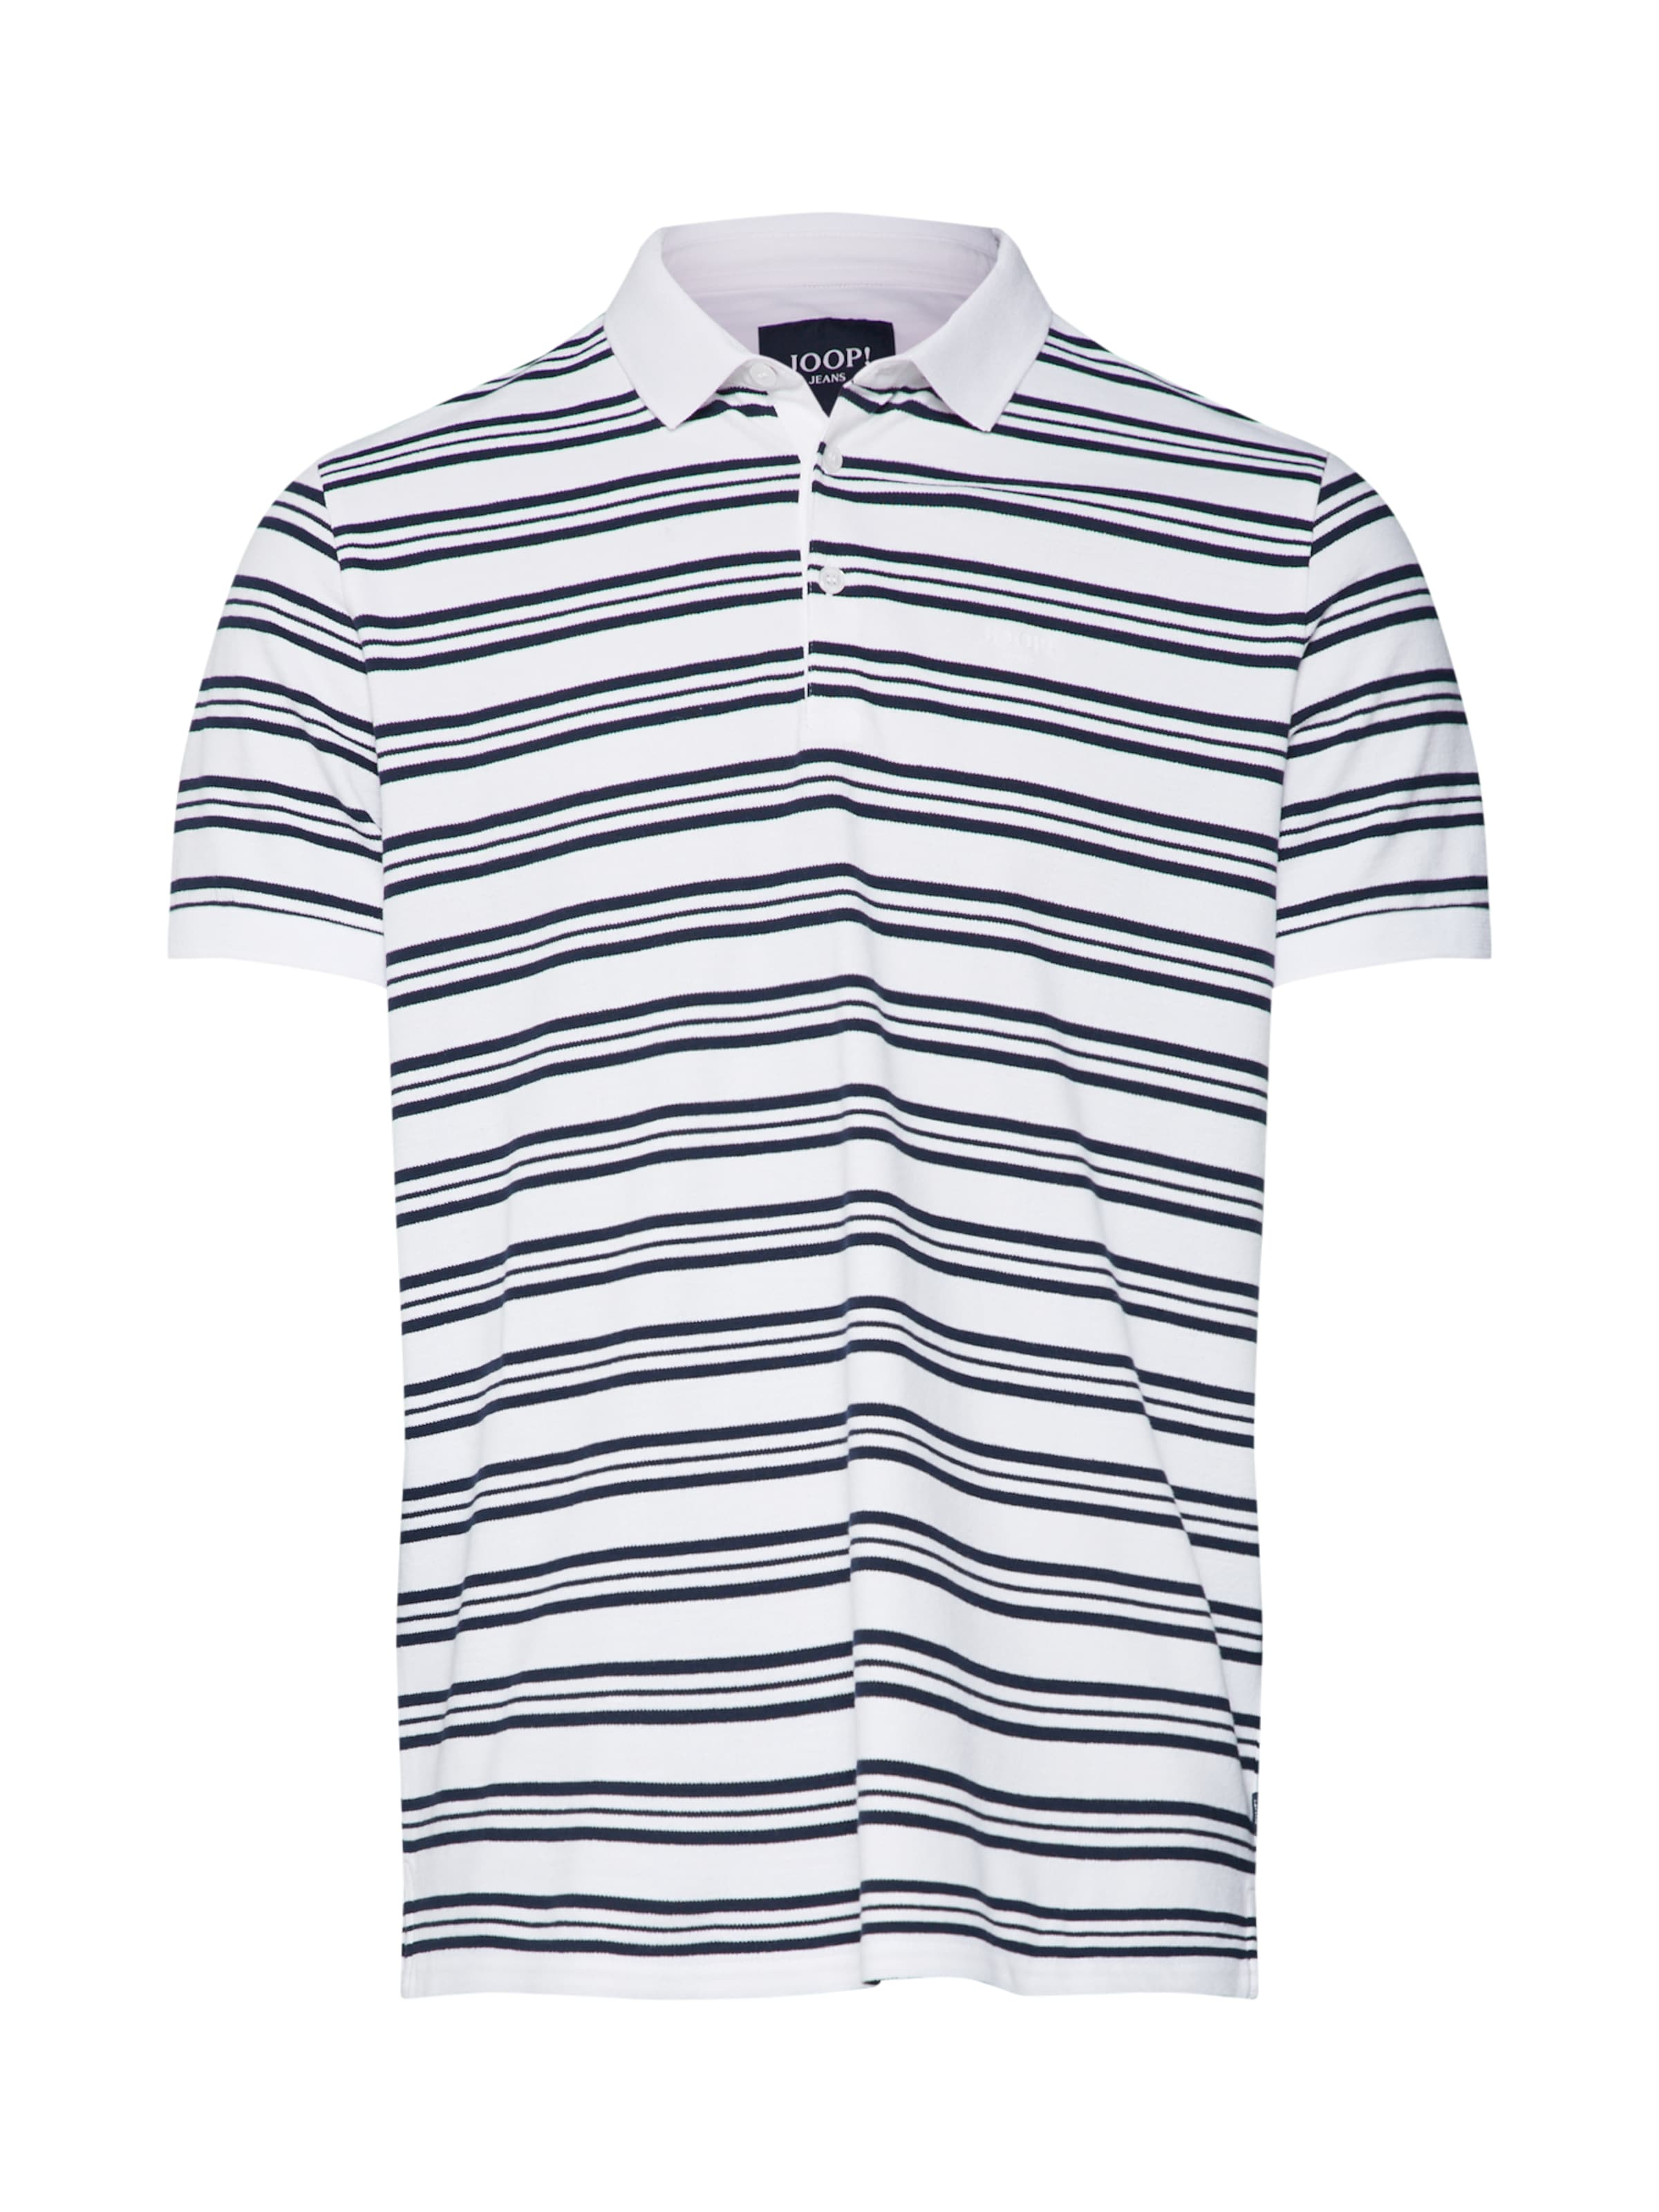 En NoirBlanc JoopT 'siro' En shirt JoopT 'siro' shirt NoirBlanc mw8vnNO0